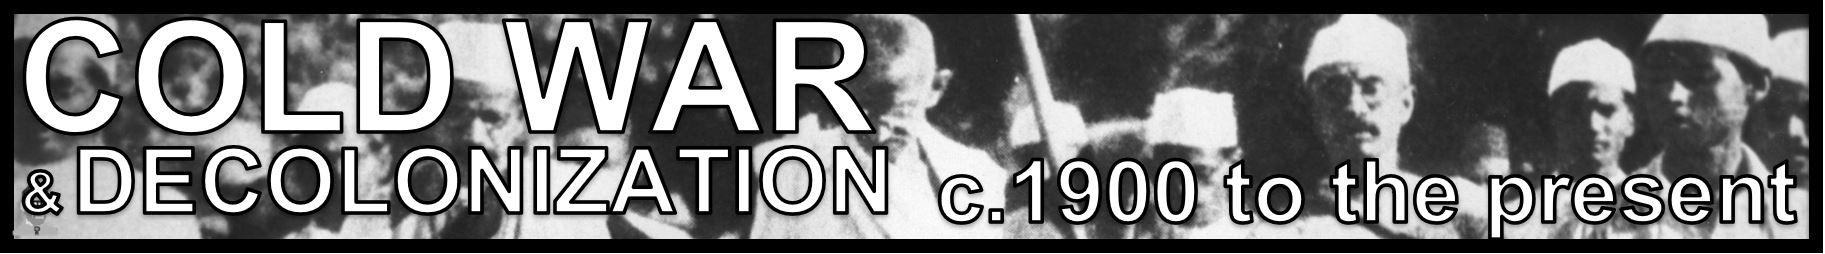 8 COLD WAR & DECOLONIZATION AP WORLD MODERN FREEMANPEDIA.JPG